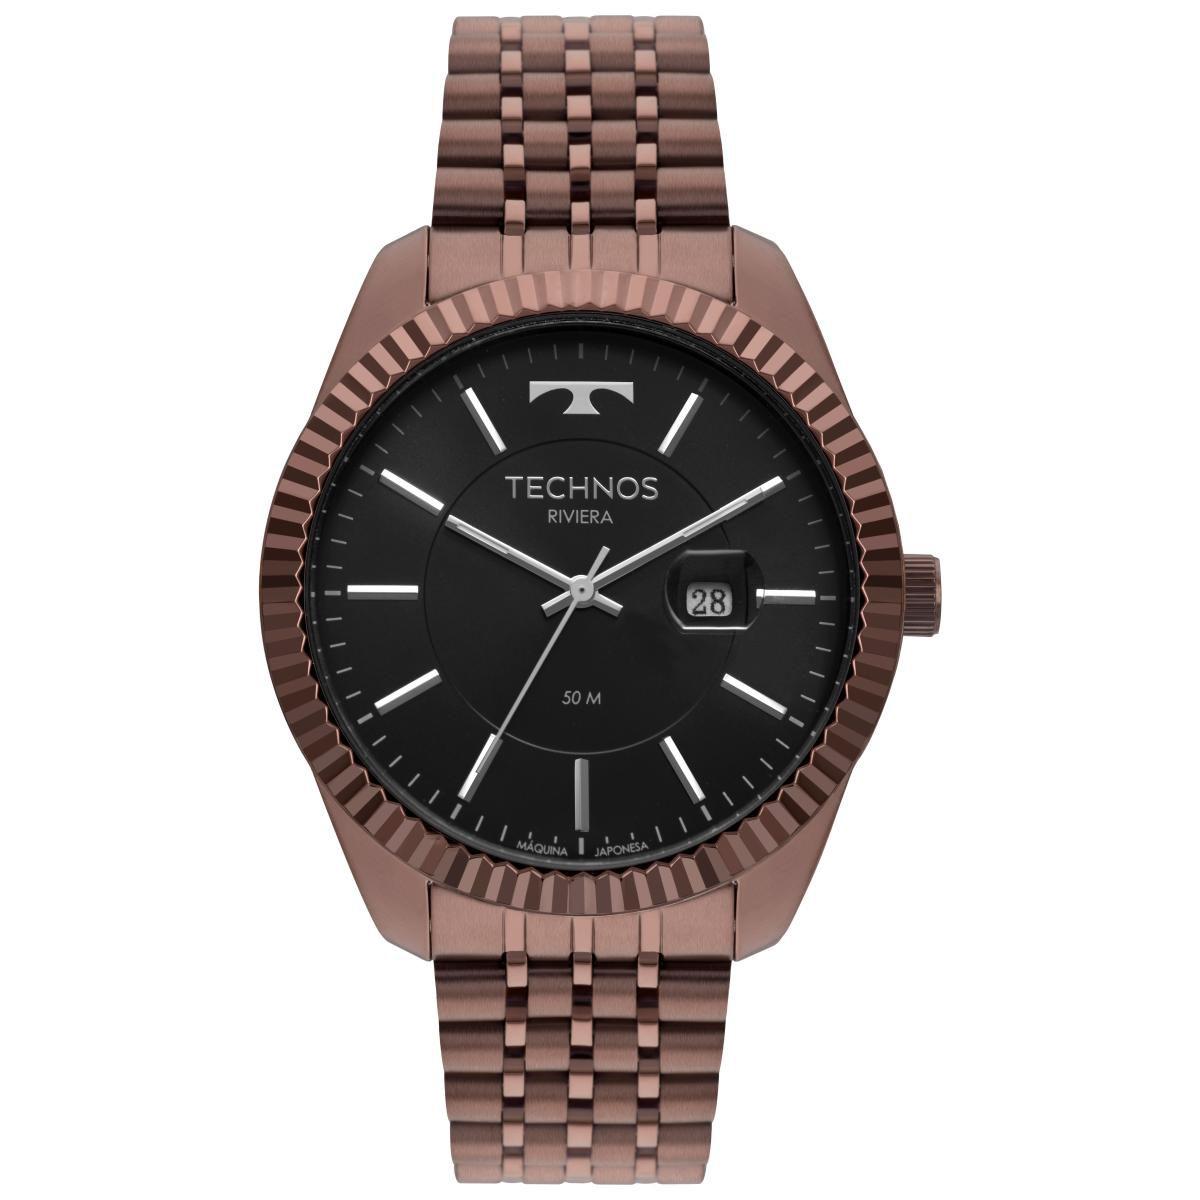 Relógio Masculino Technos Riviera 2115MSW/4P 46mm Aço Marrom